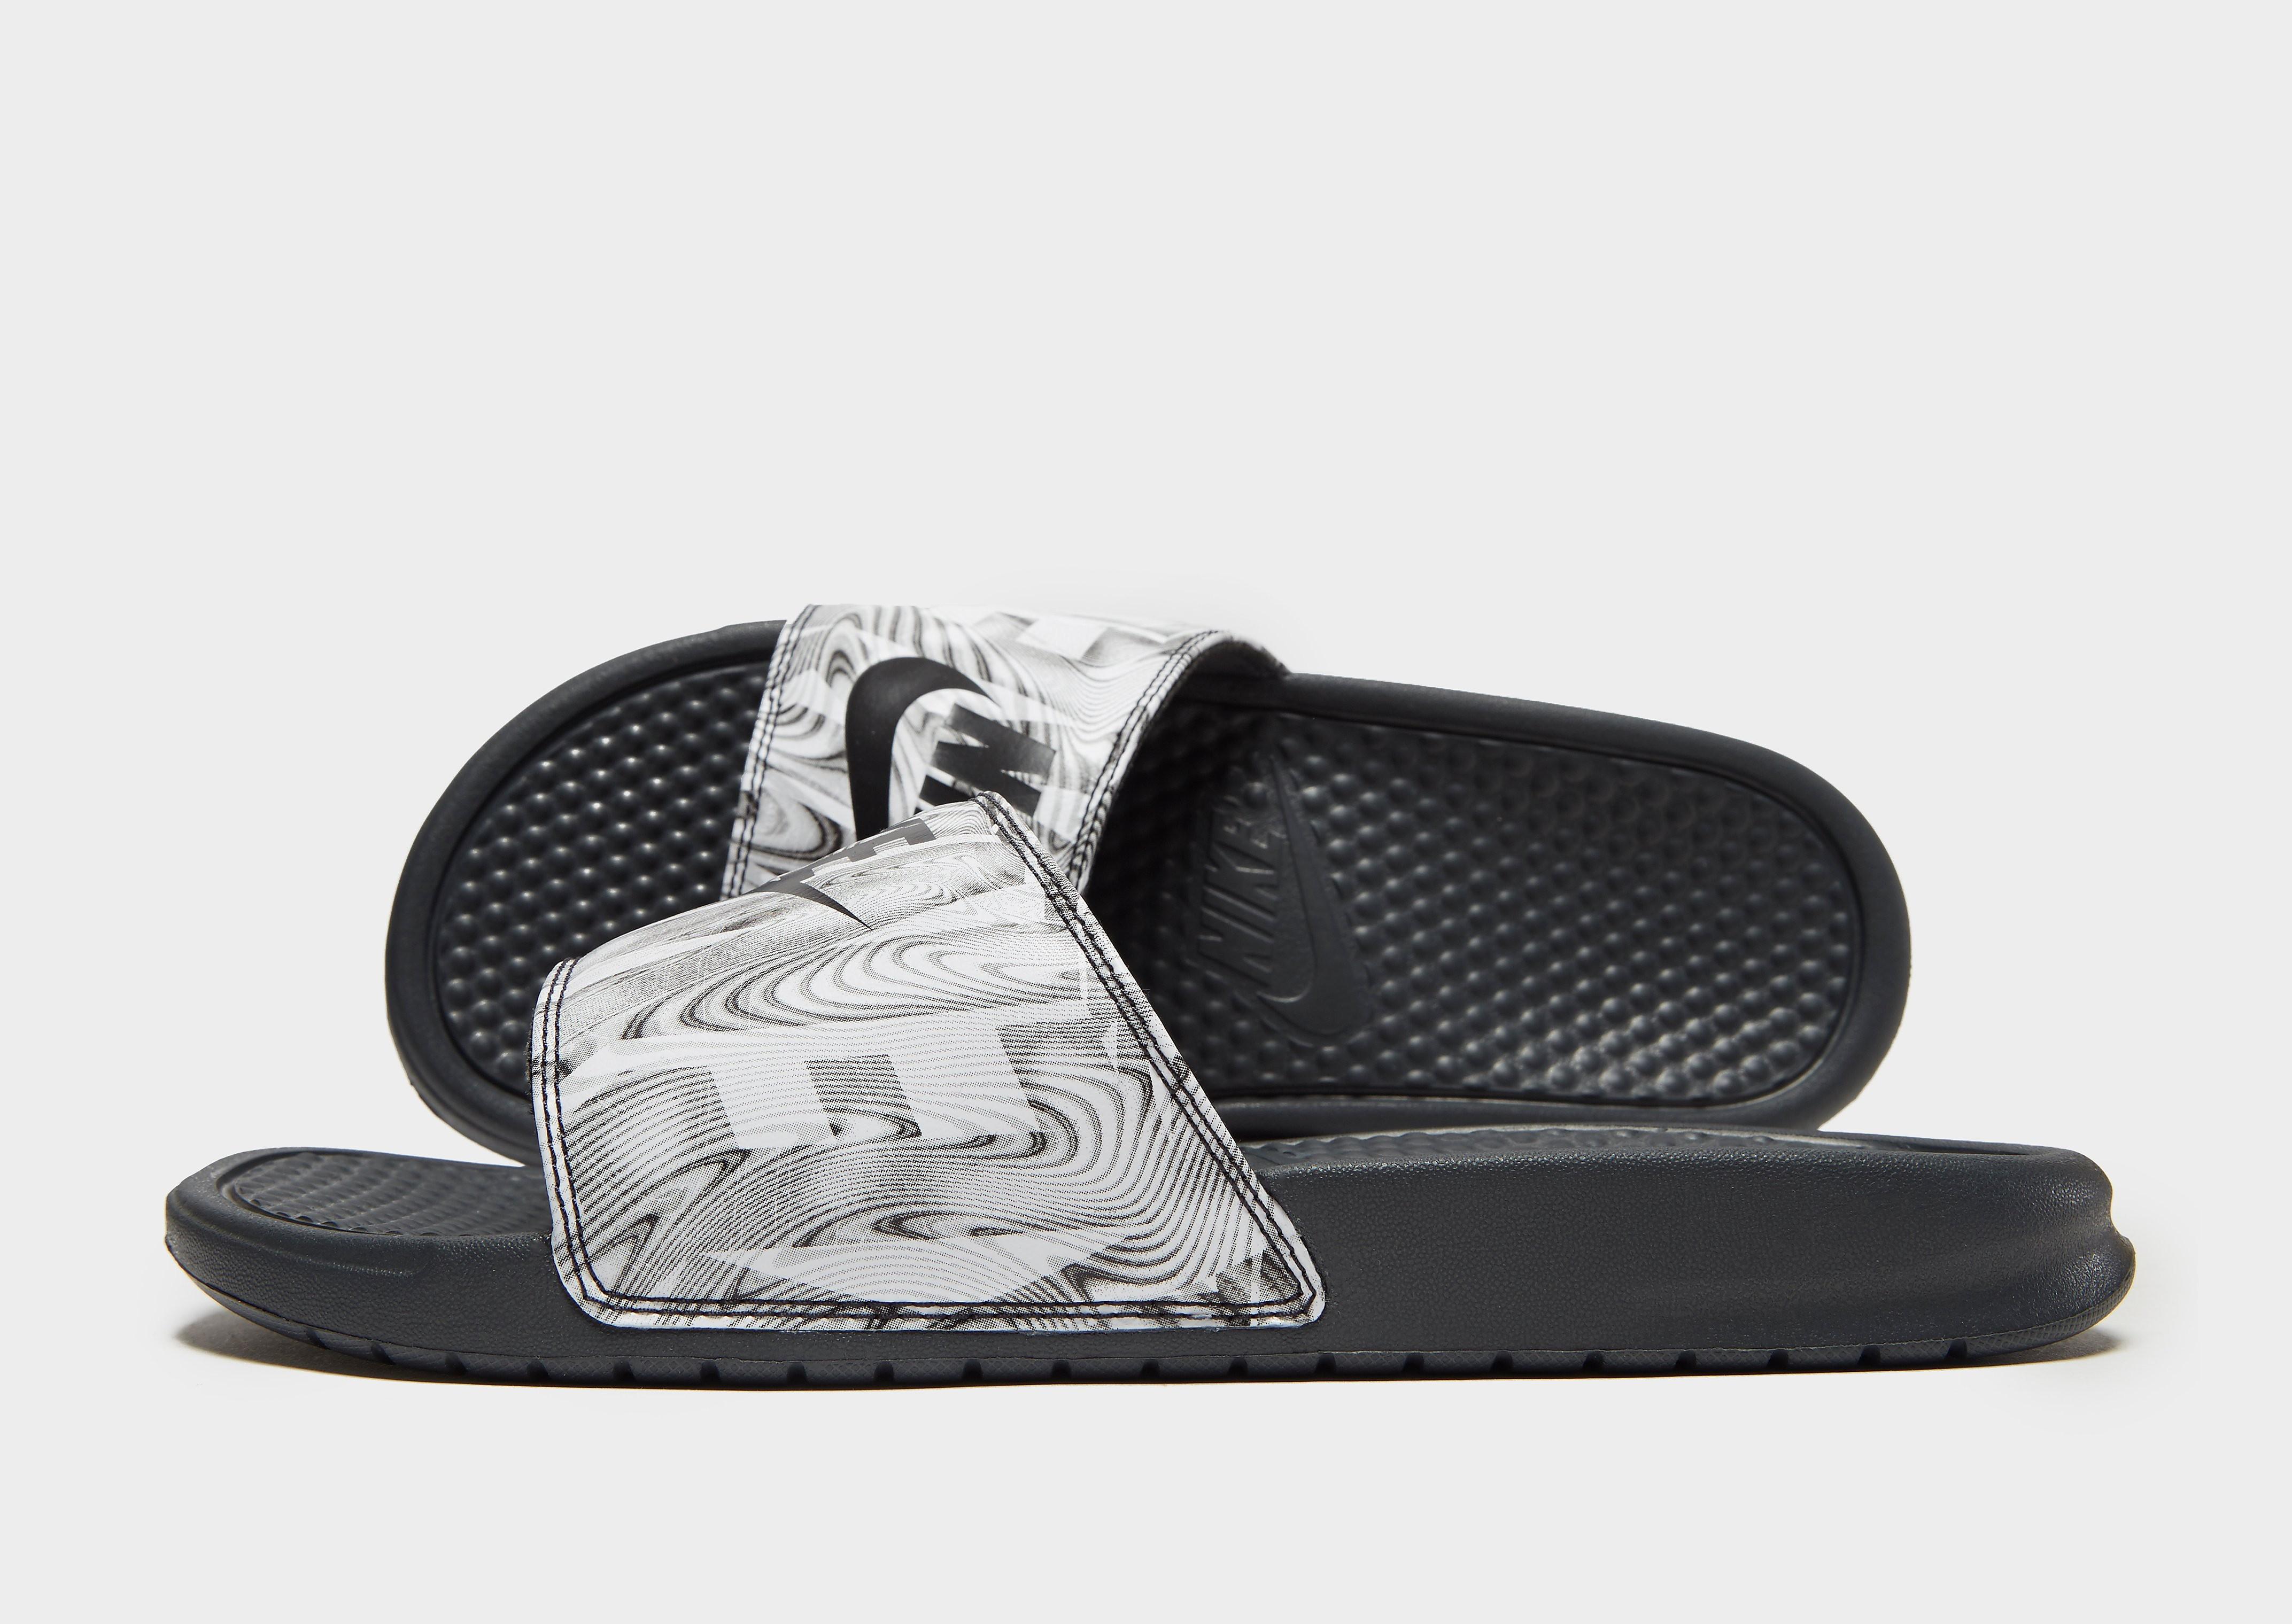 4b743fe1181 Aanbieding: Nike Benassi Se Slides Heren Zwart | Nike met korting